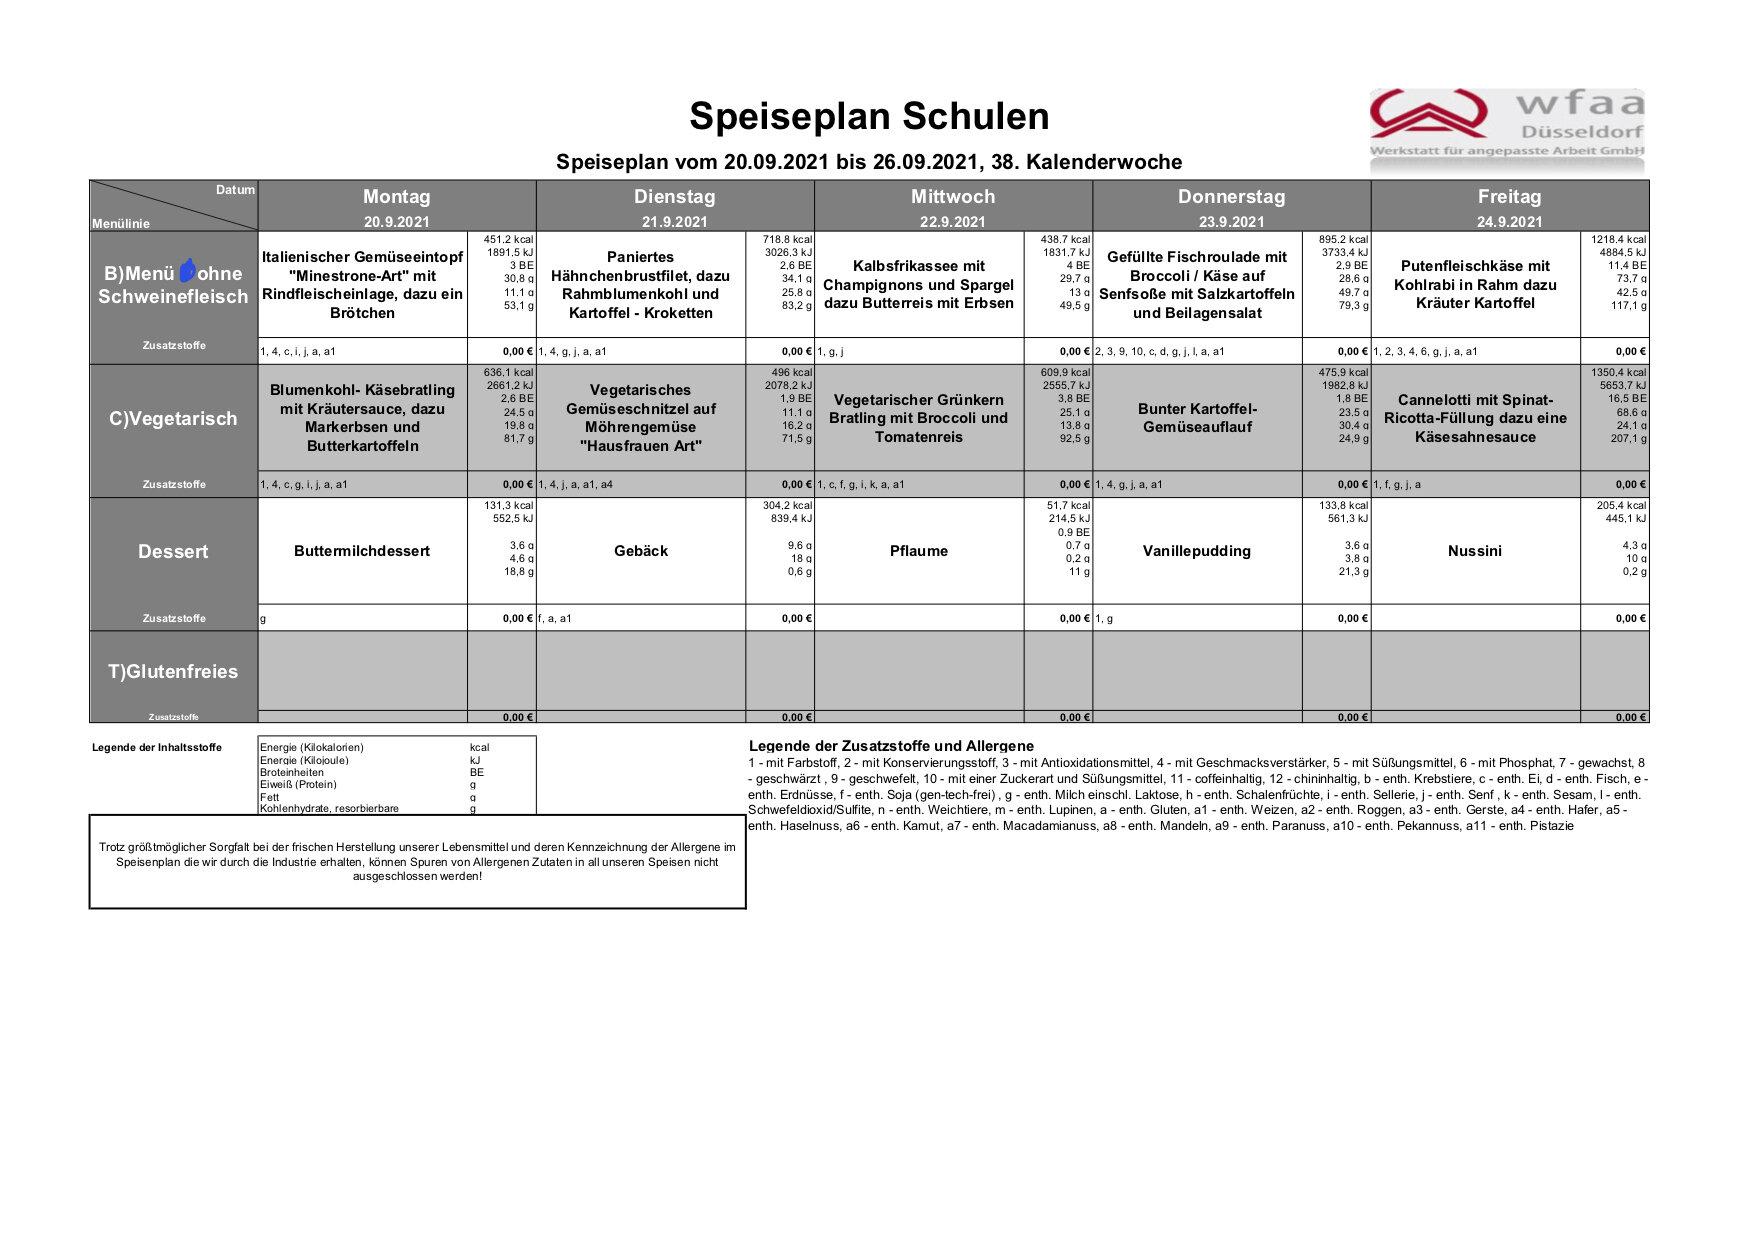 Speiseplan 20. - 26.09.2021 (KW 38)